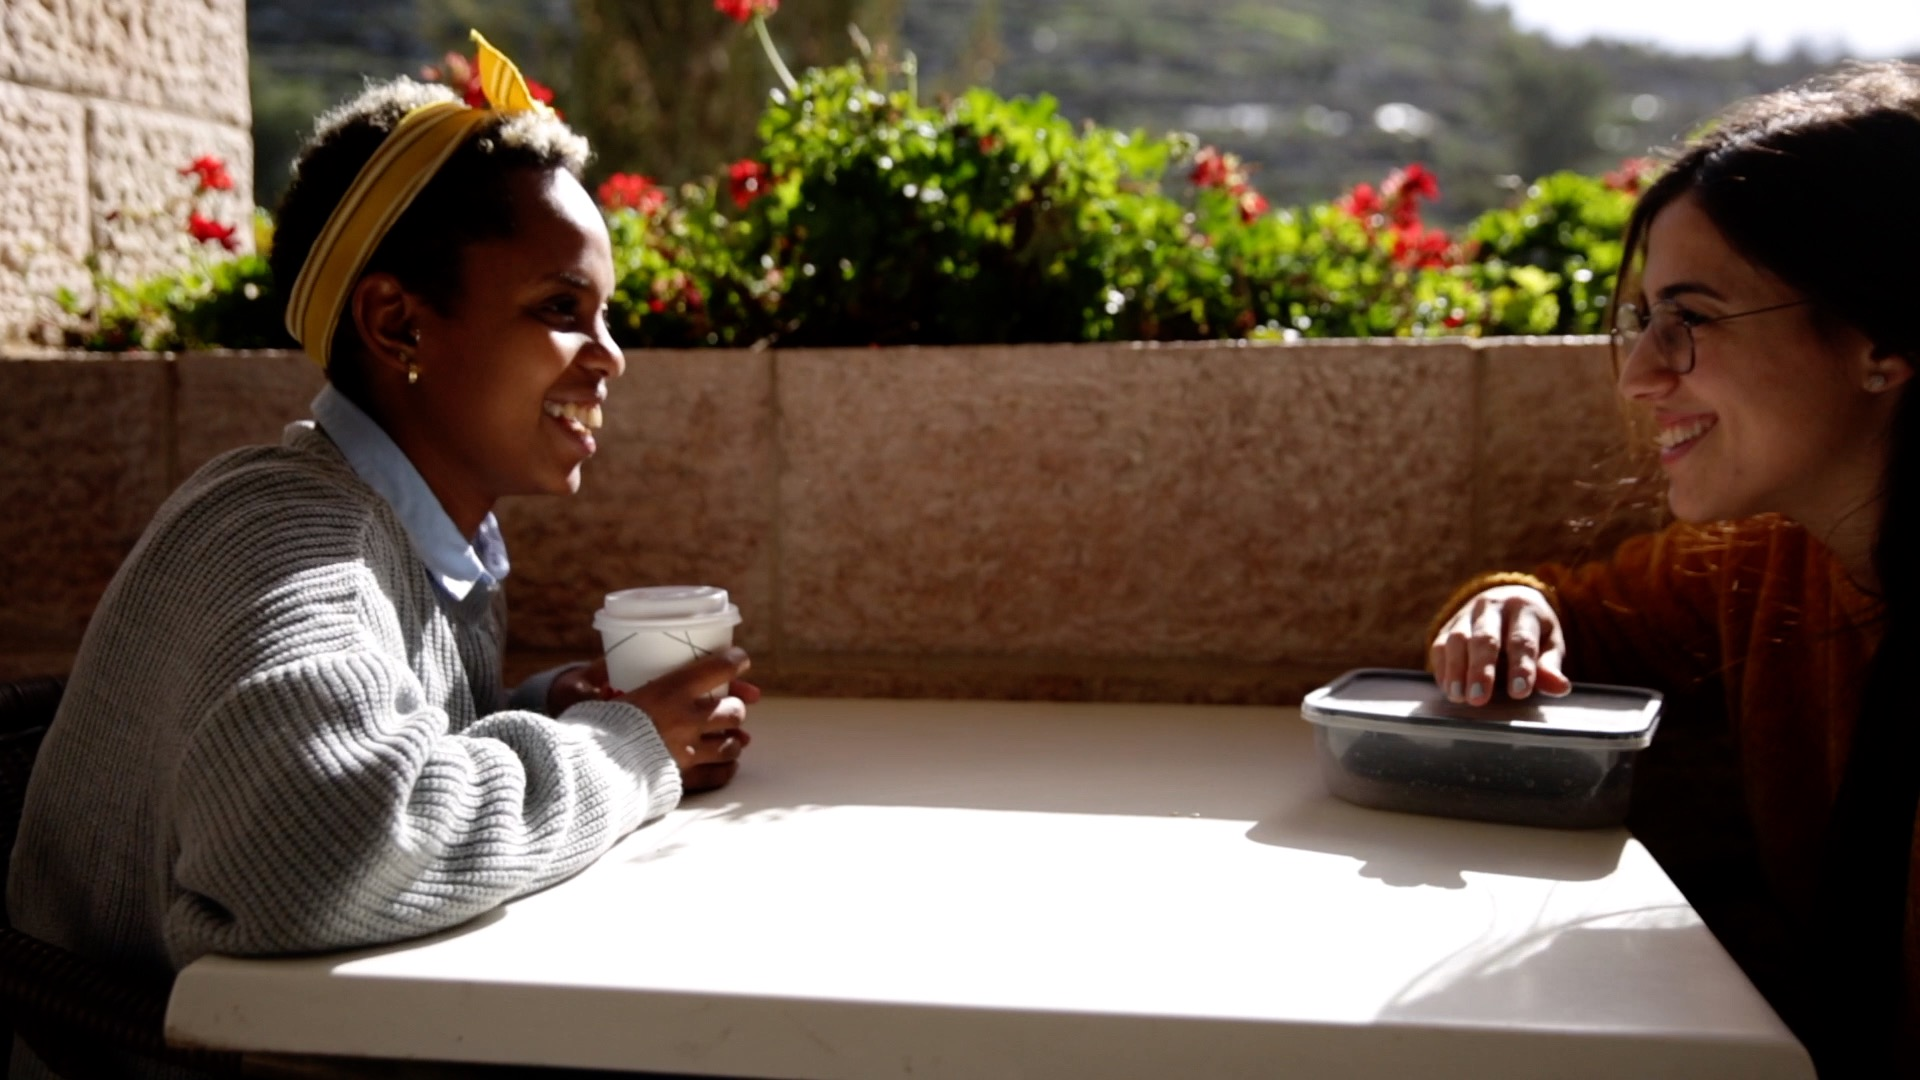 Hebrew University Student Profile: Ruth